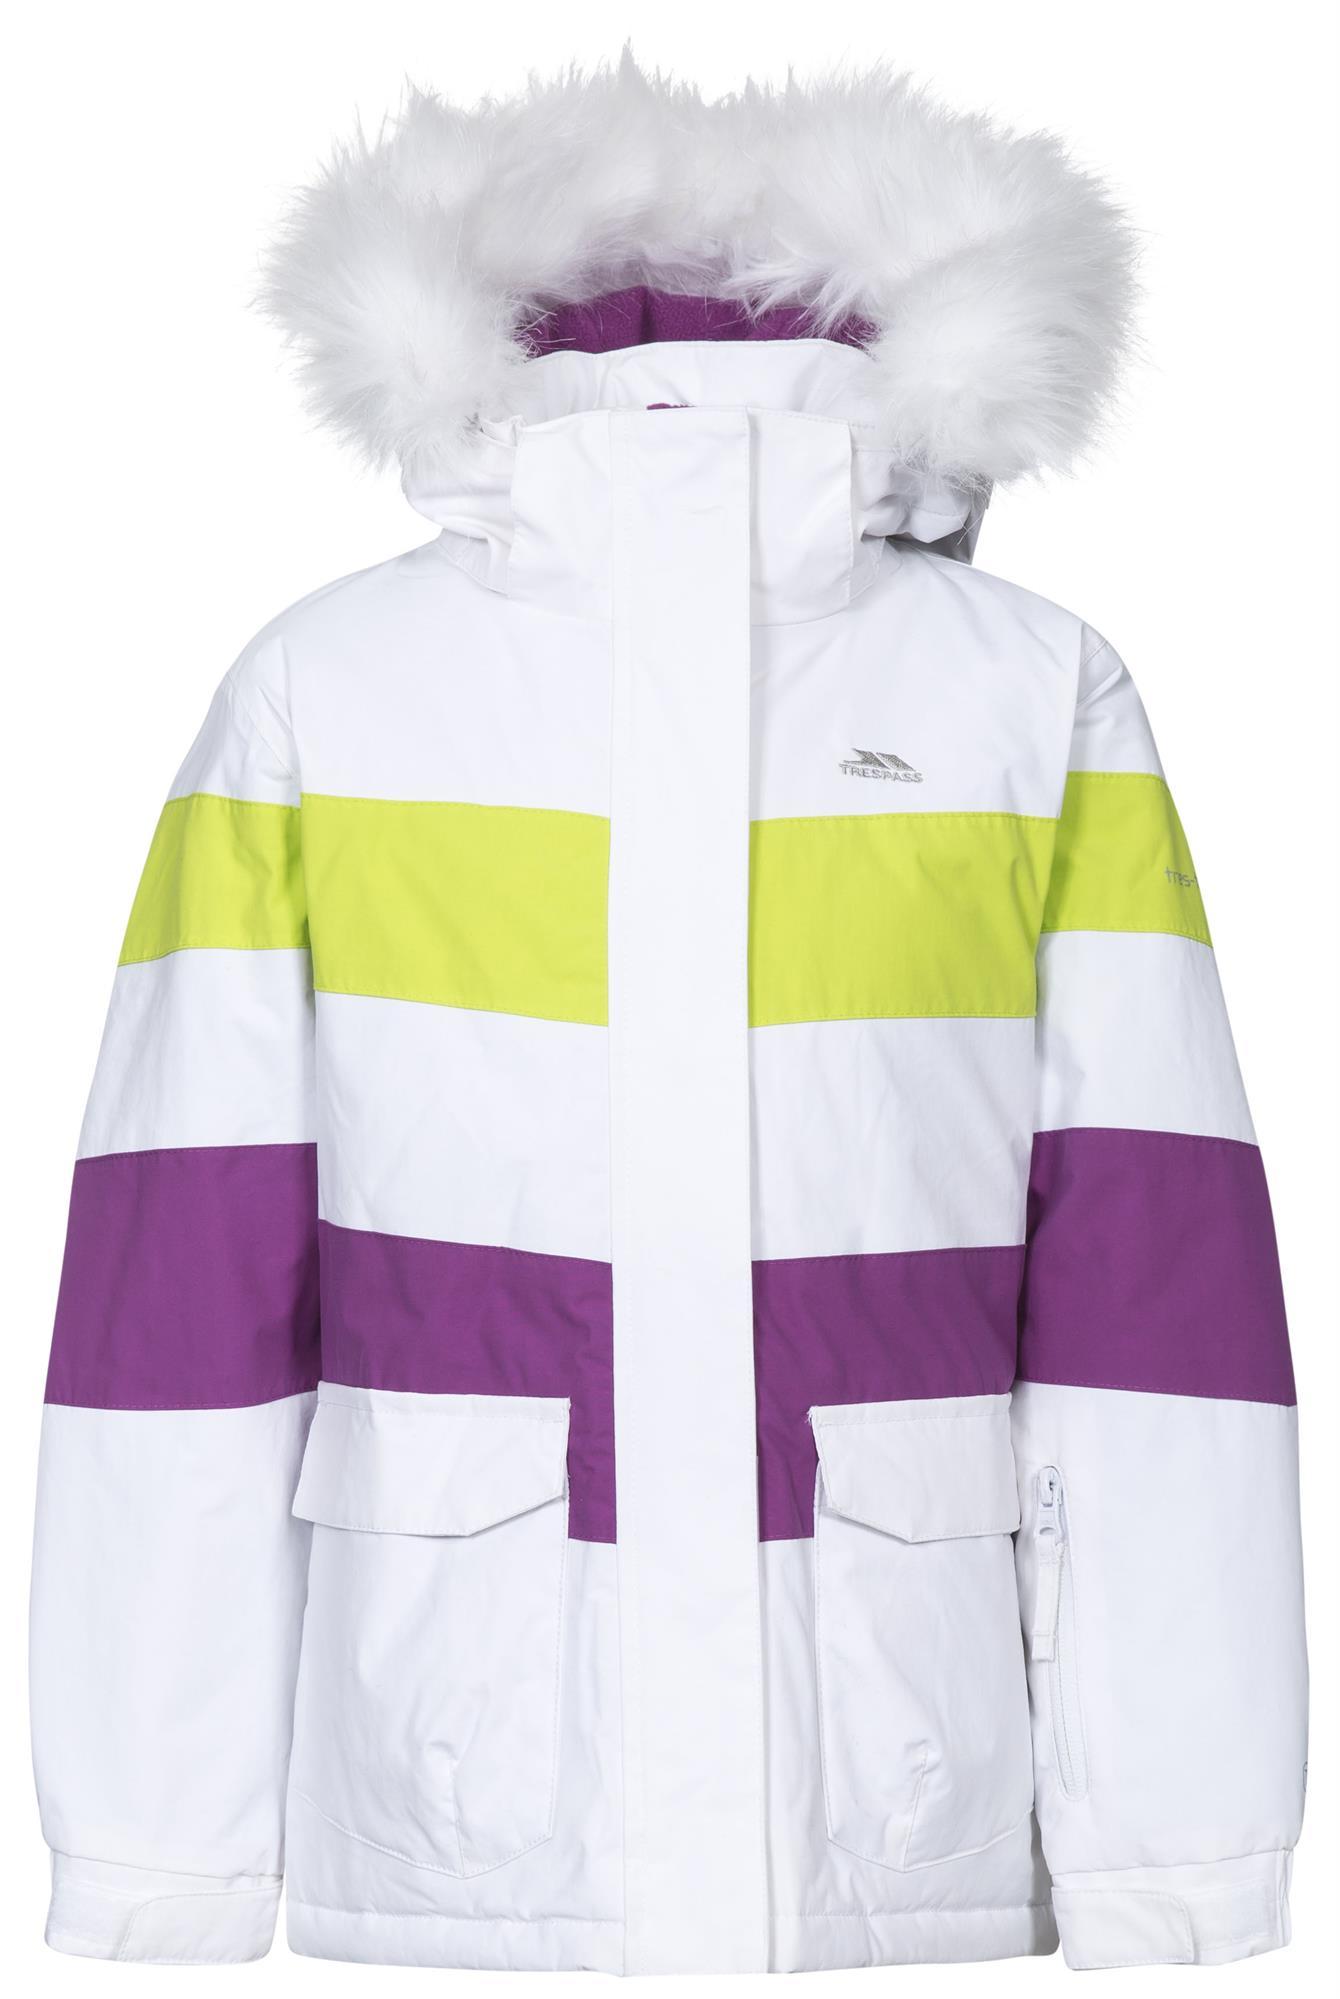 686c3f3911a Trespass Hawser Girls Ski Jacket